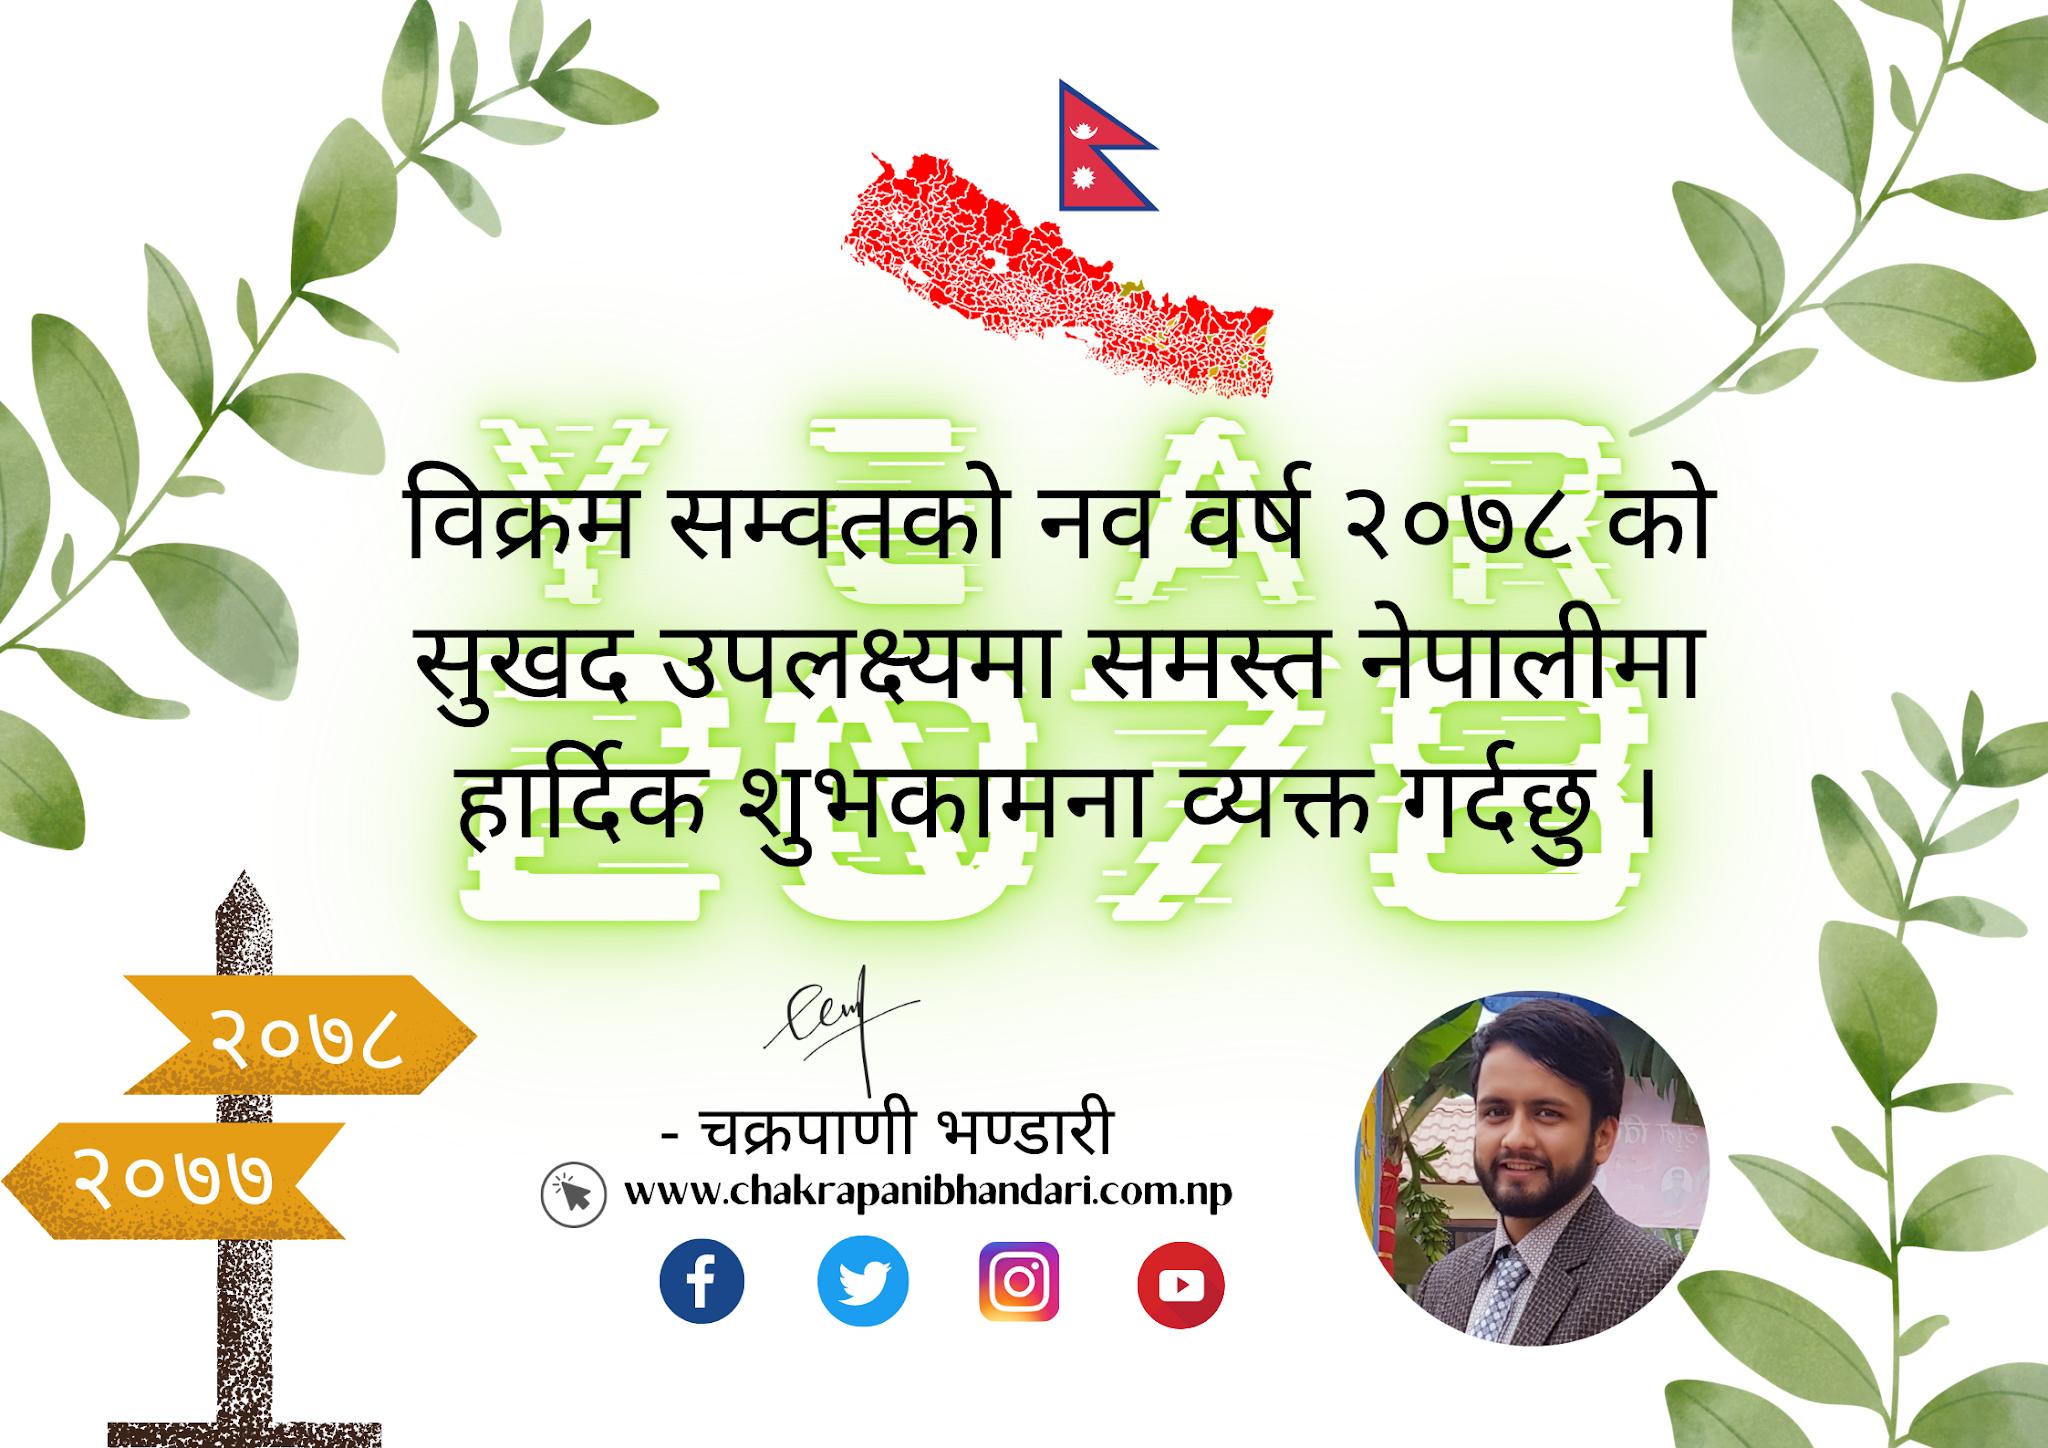 Wishing you a happy new year of Vikram Sammat 2078.